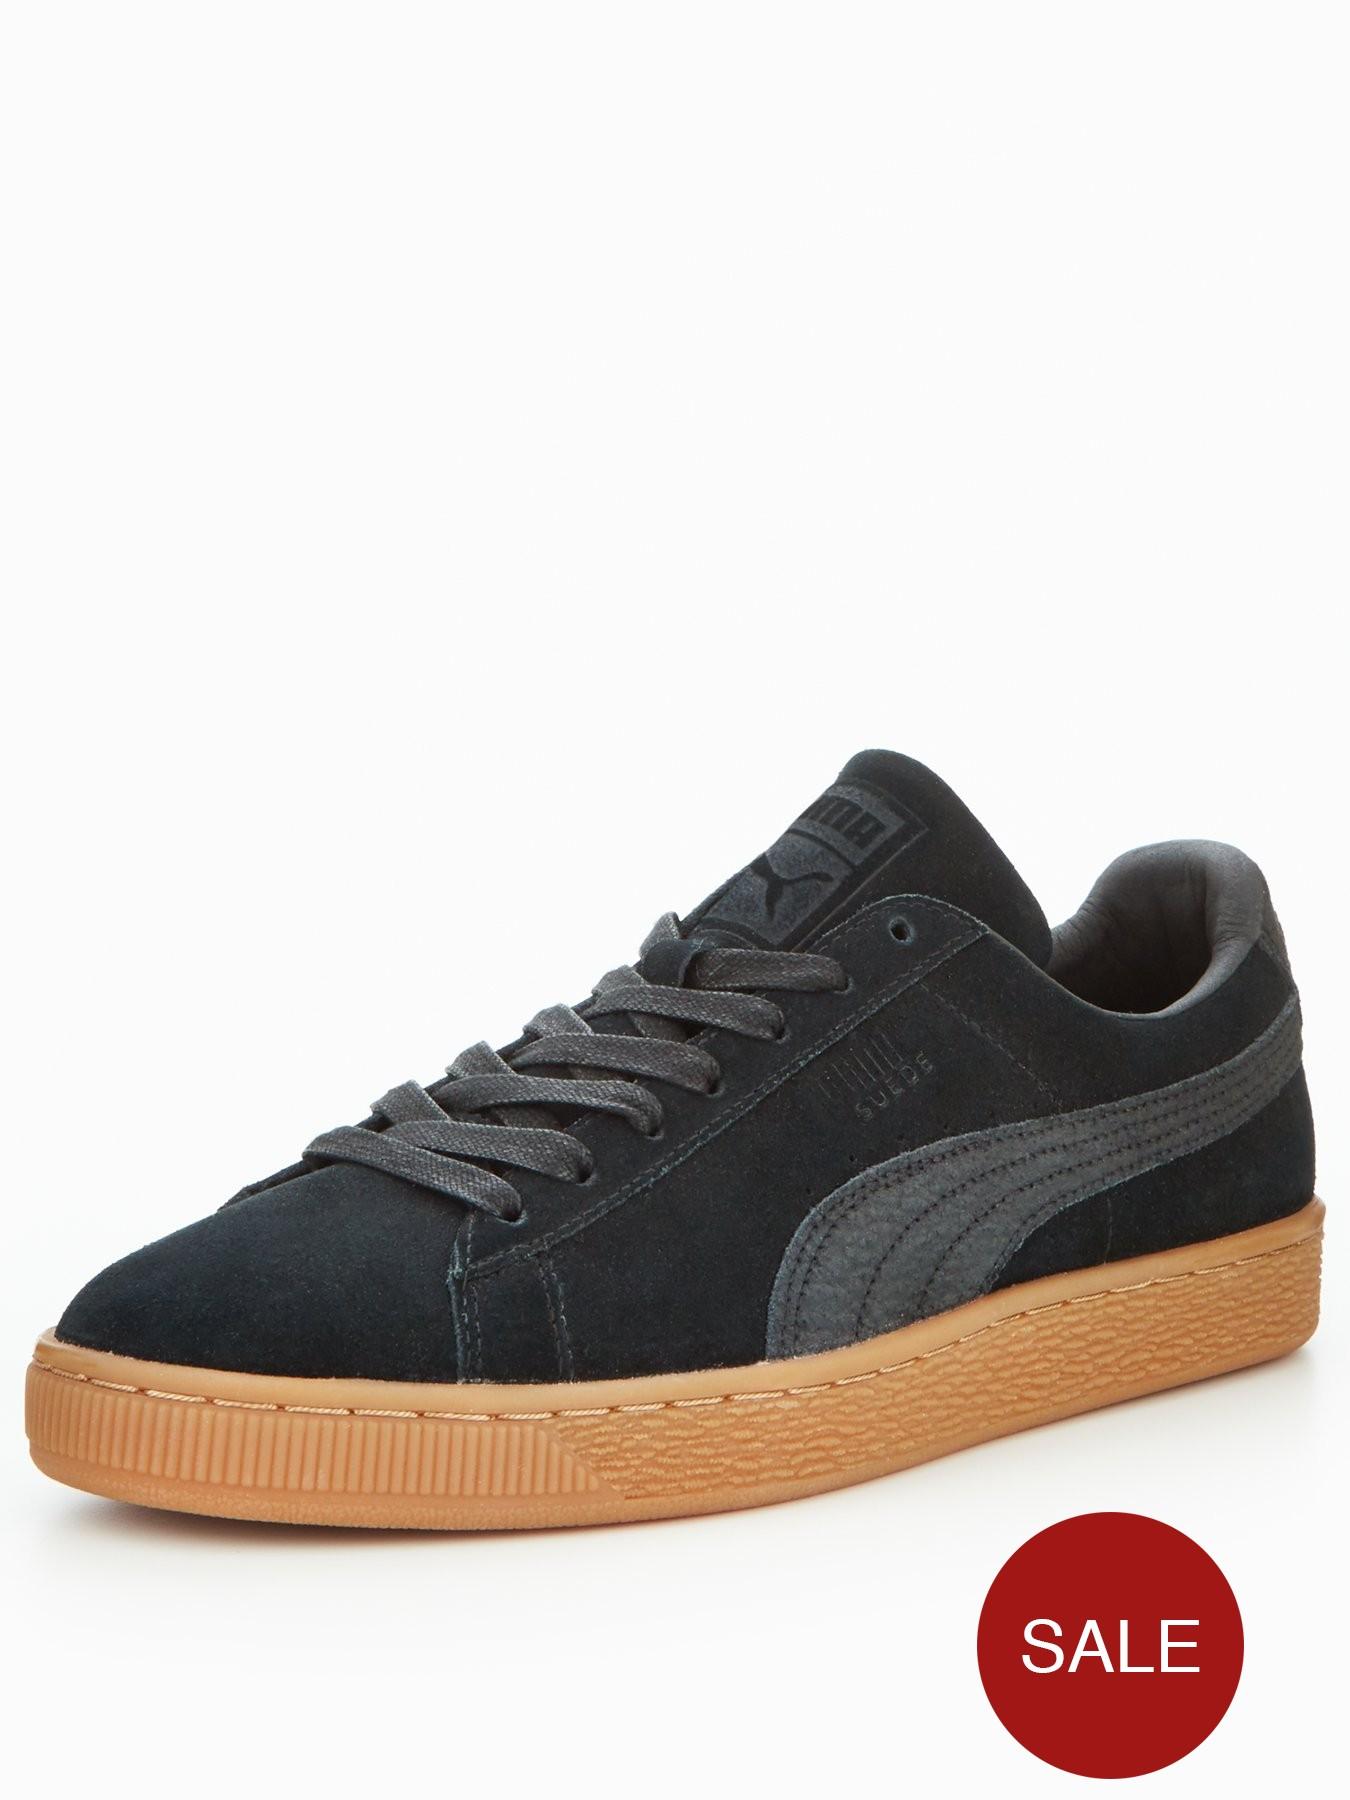 Puma Suede Classic Natural Warmth 1600172116 Men's Shoes Puma Trainers